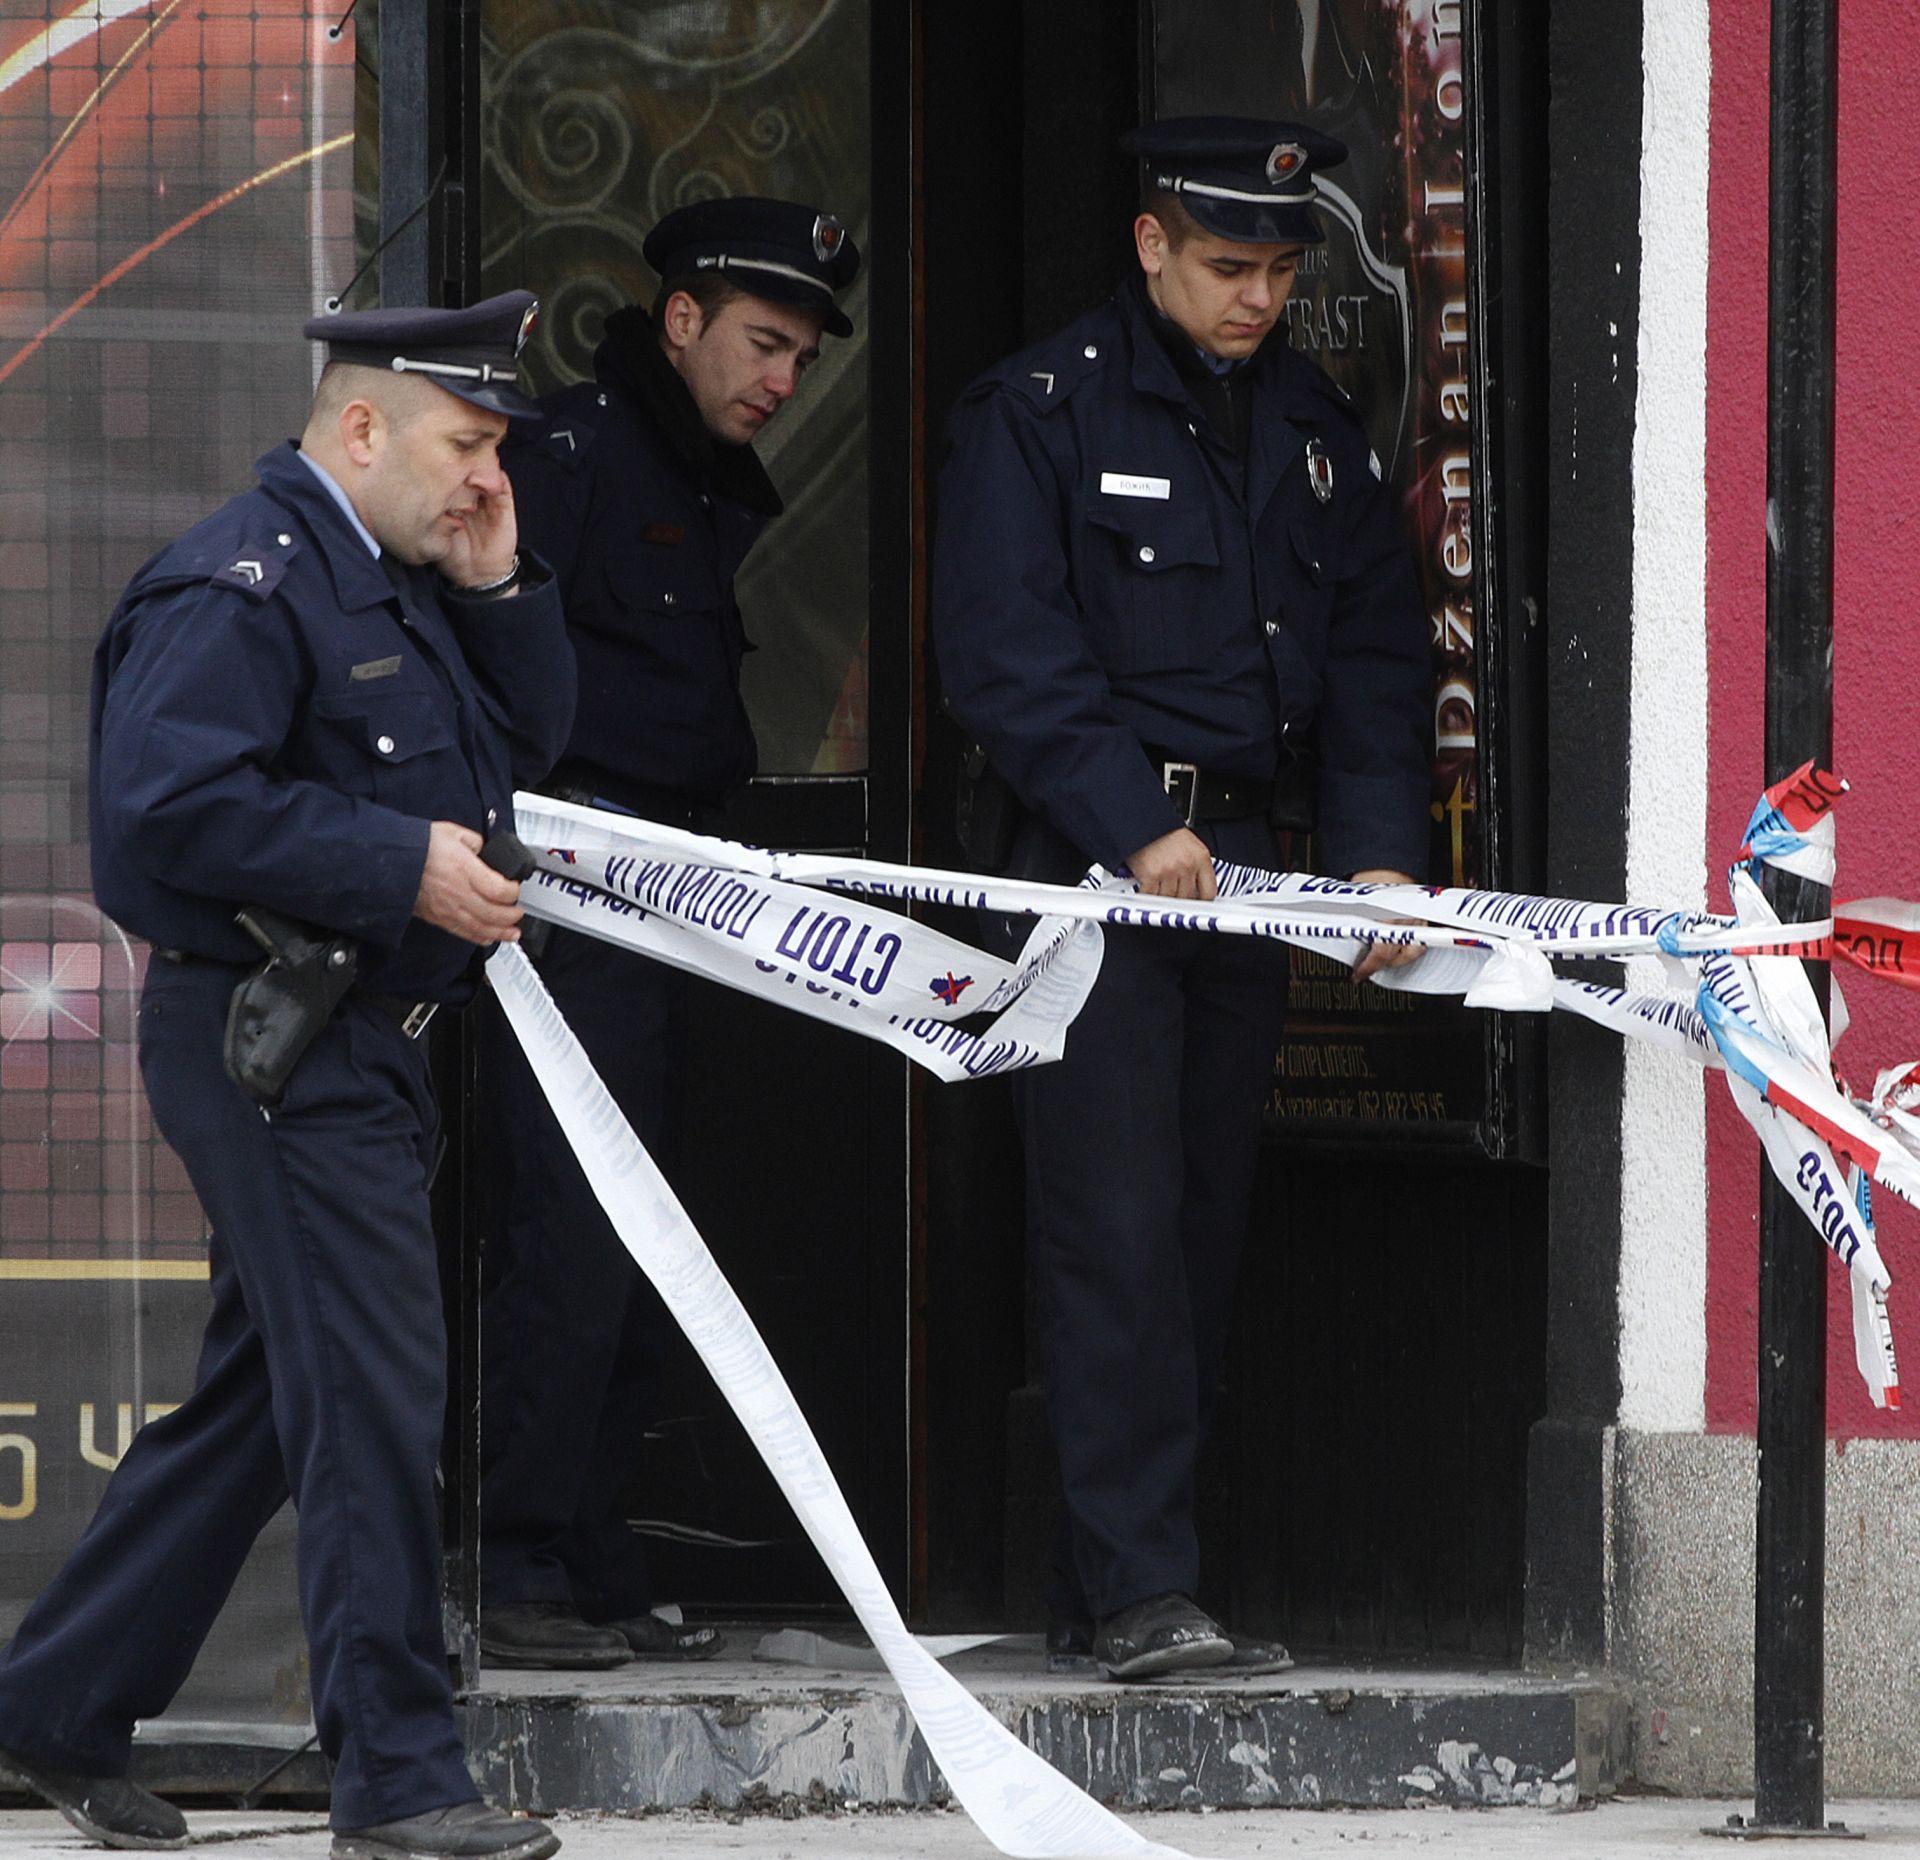 Trojica mladih Hrvata pretučena u Vojvodini